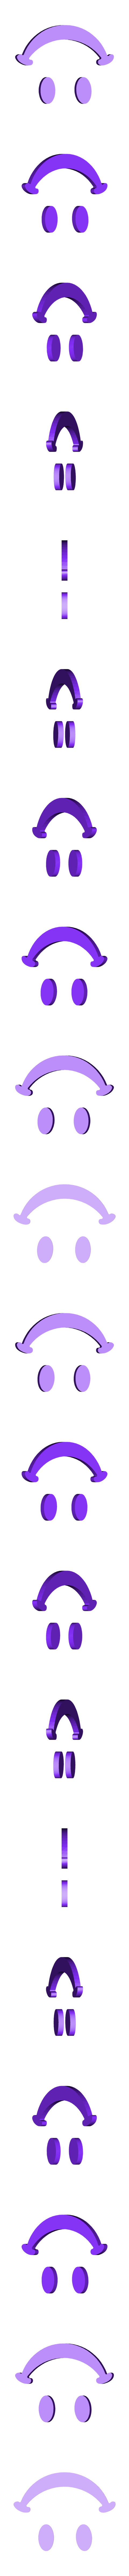 Smiley_Logo.STL Download free STL file SMILEY FACE Golf Ball Marker • 3D printing design, Balkhagal4D